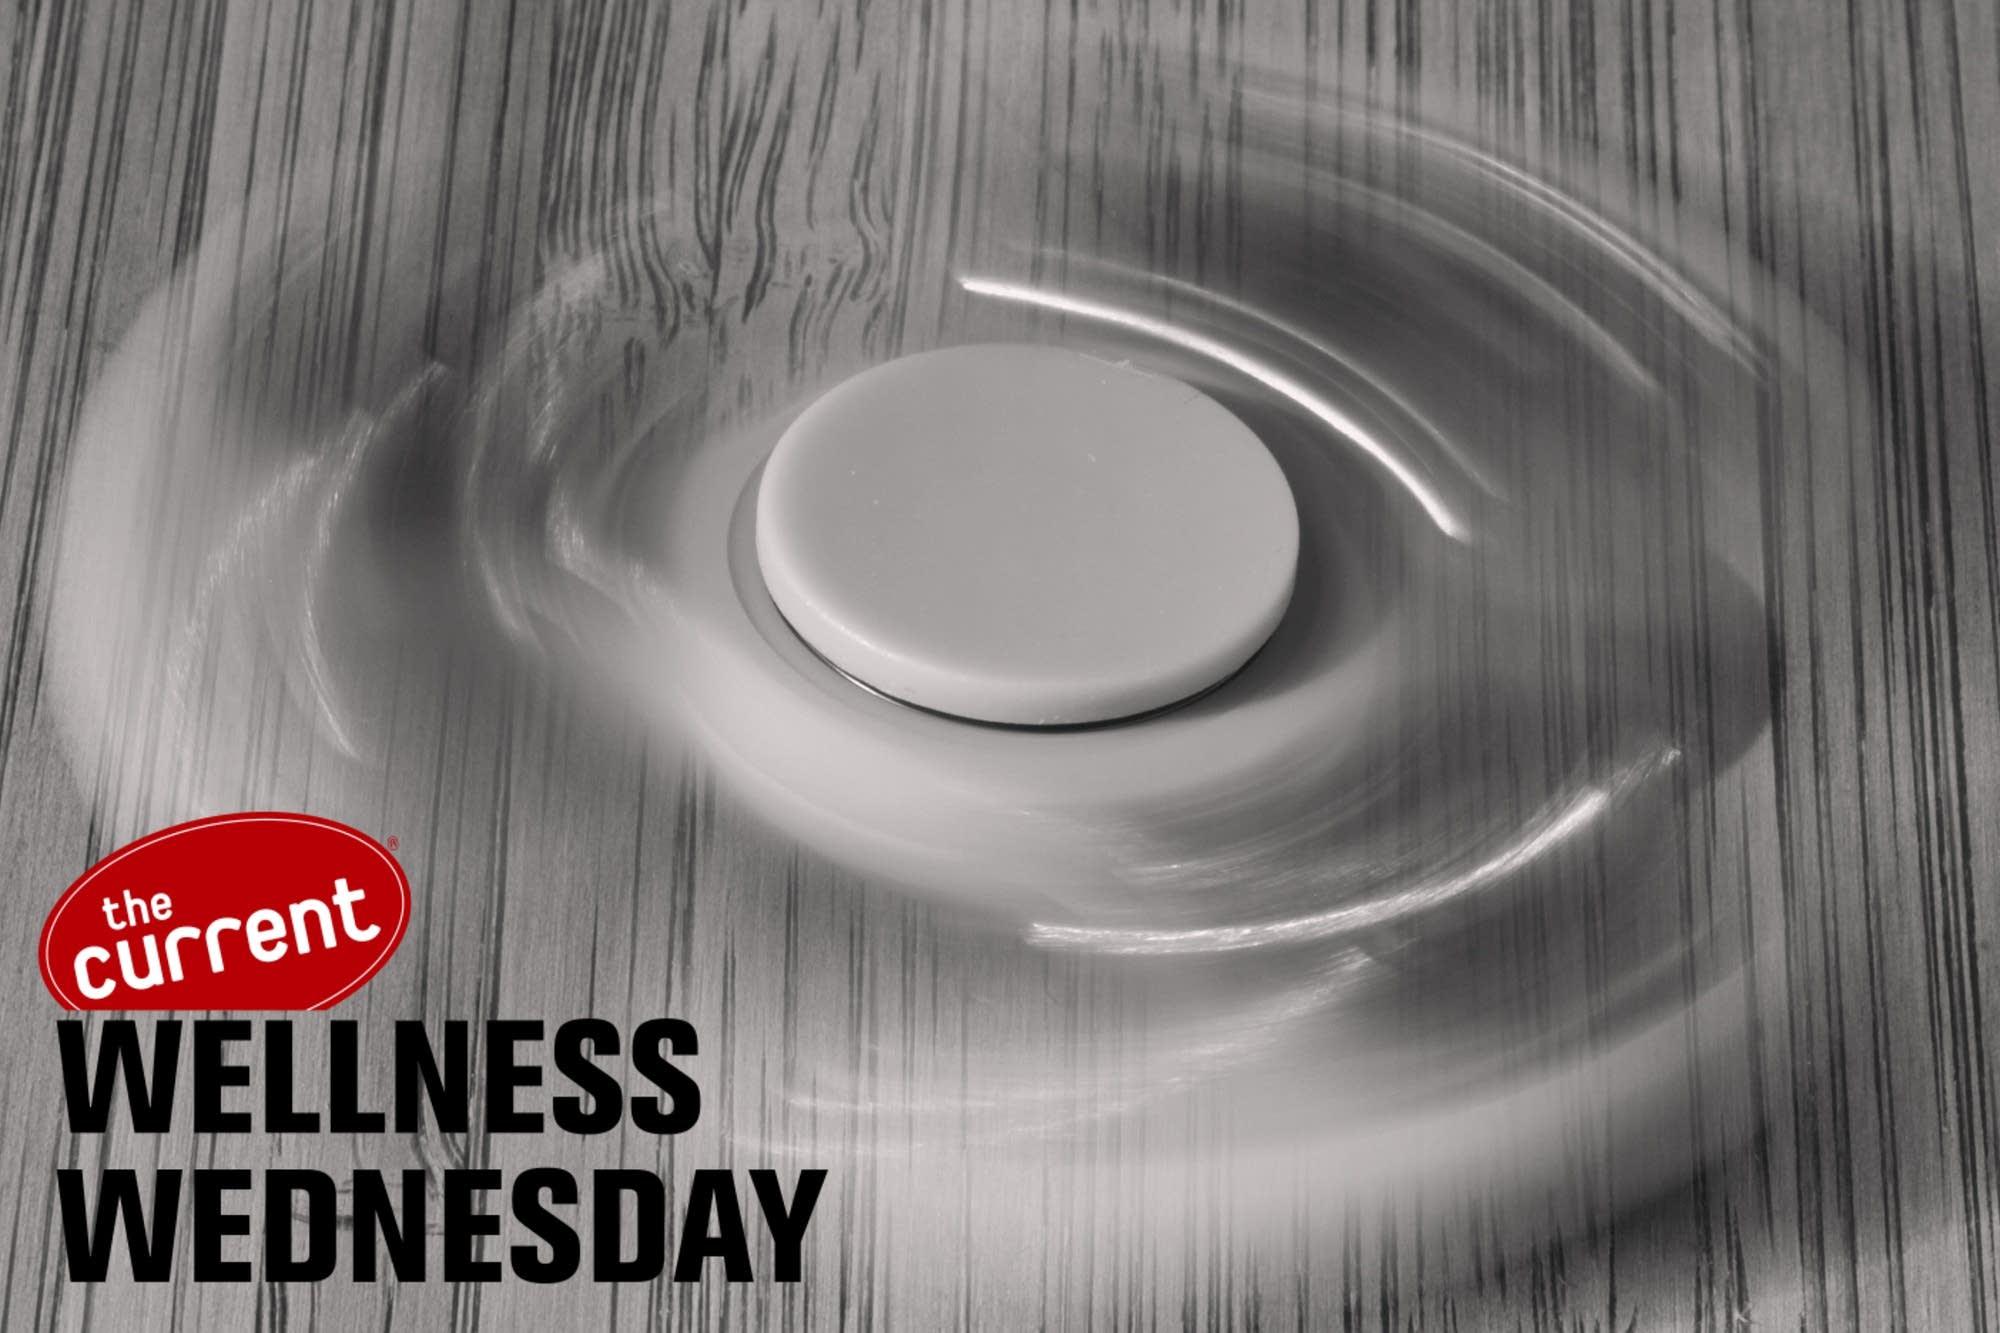 Black and white image of fidget spinner, motion blurred.